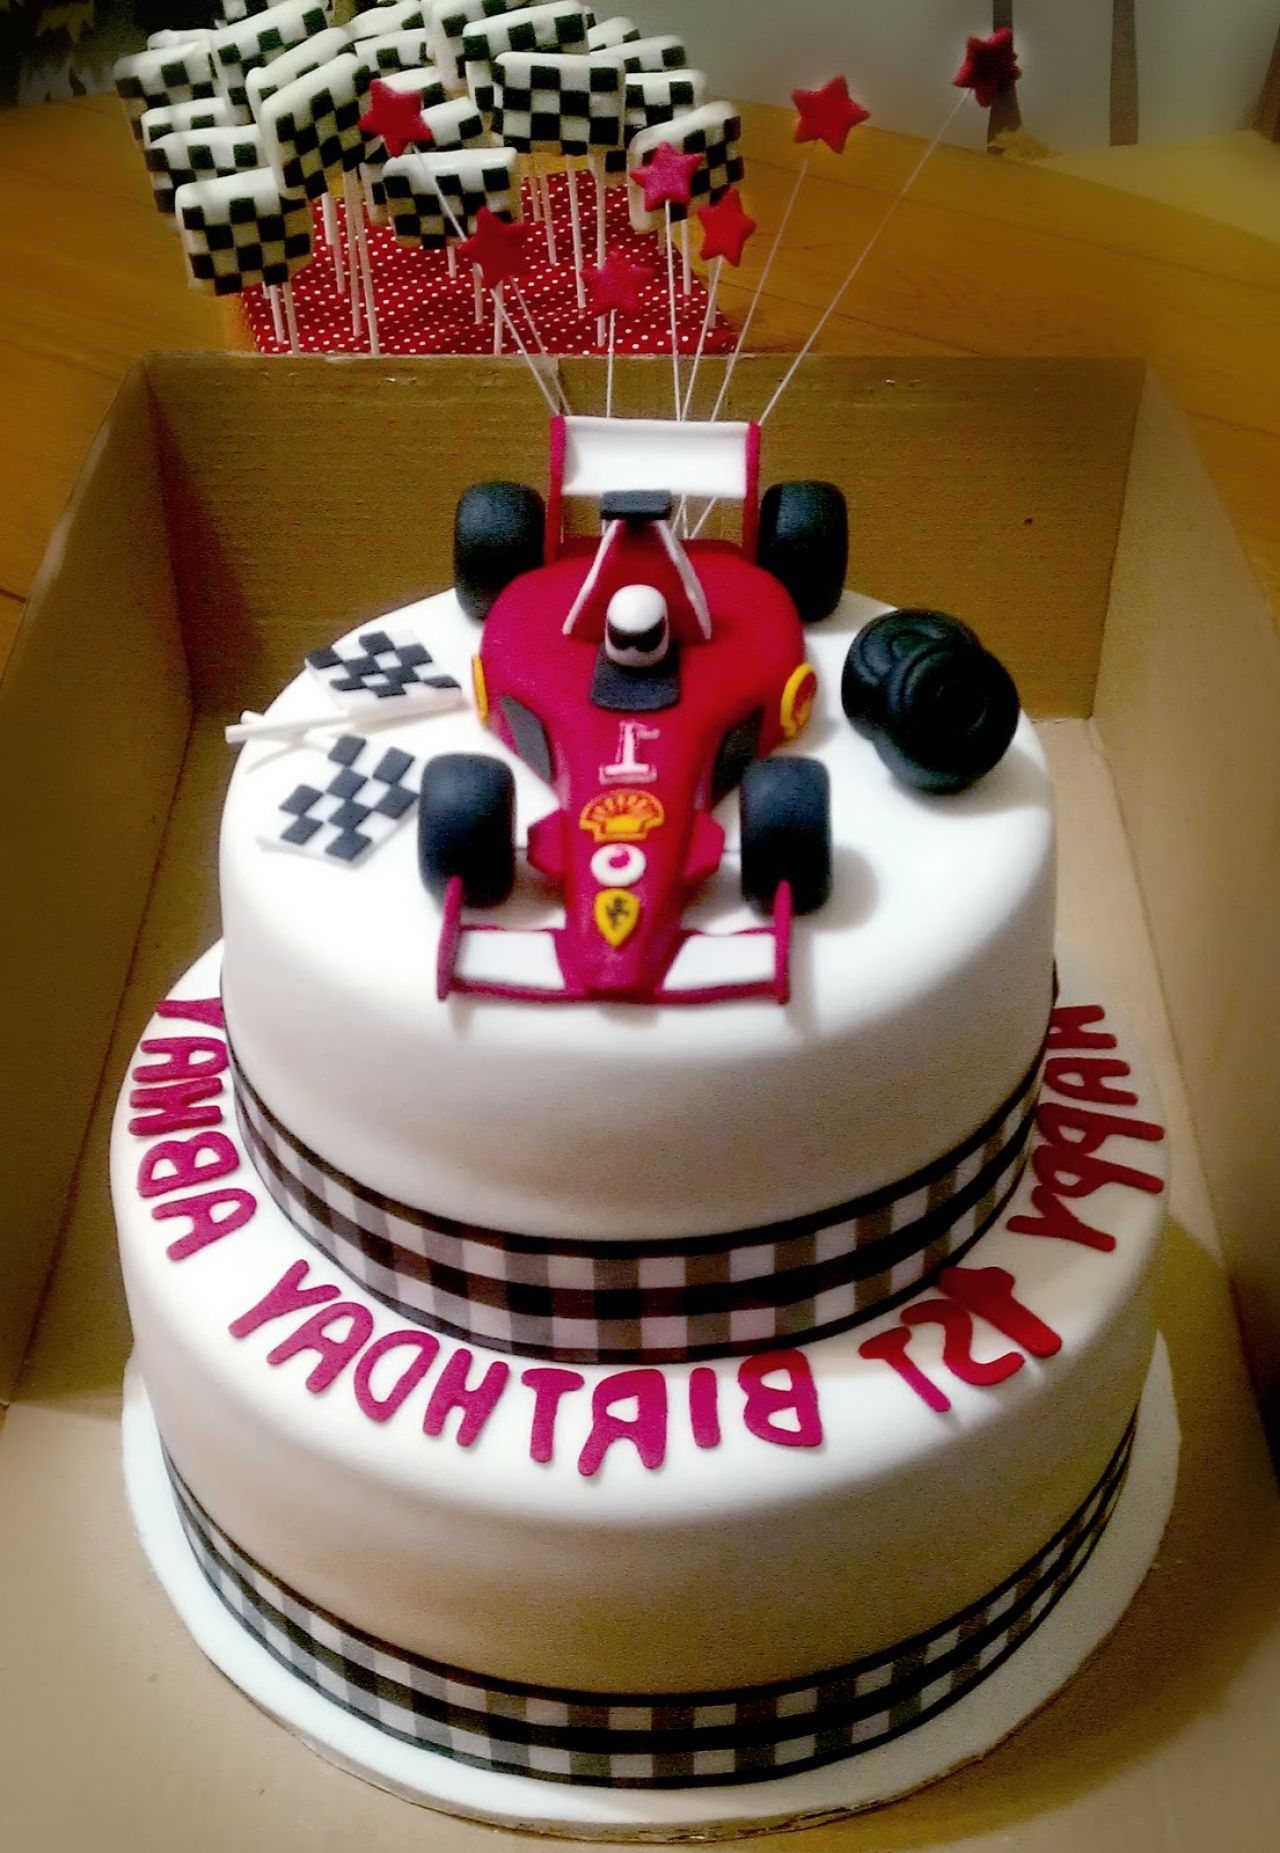 F1 Ferrari Racing Car 1st Birthday Cake With Checkered